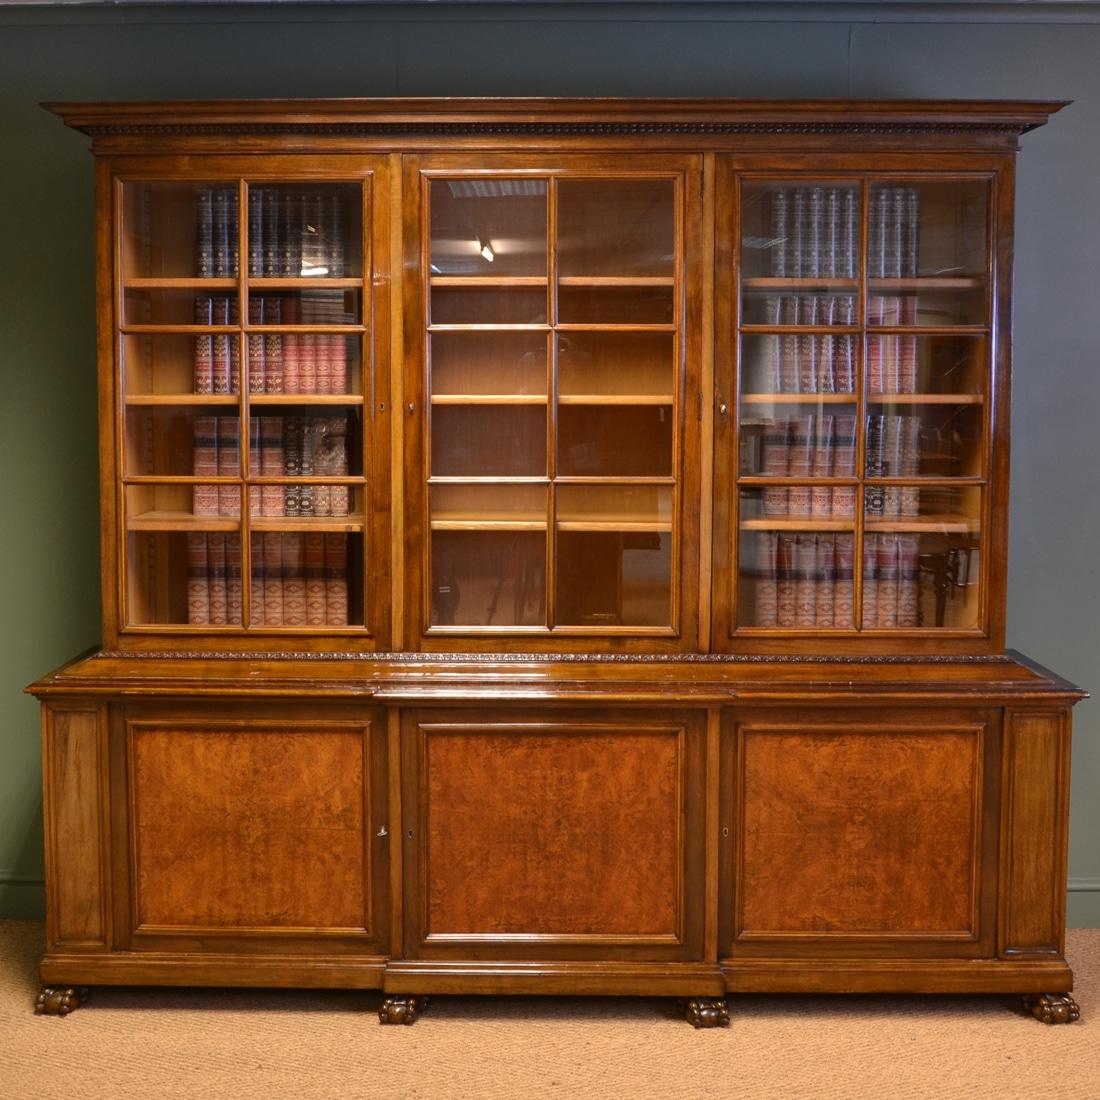 Antique Bookshelves: Stunning Large Edwardian Figured Walnut Antique Library